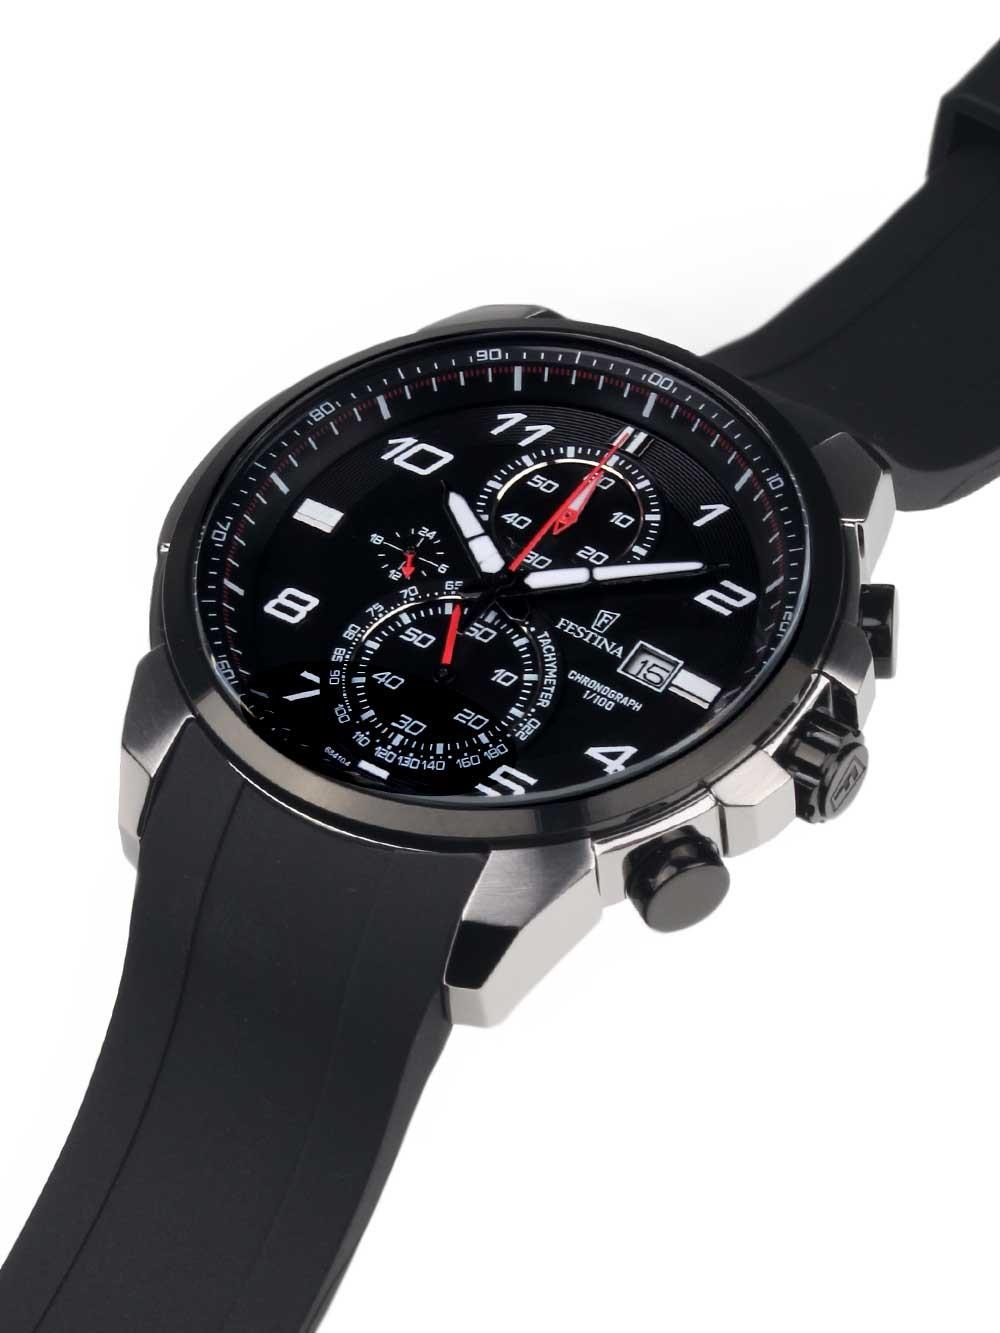 watches chrono12 festina f6841 4 chronograph herren. Black Bedroom Furniture Sets. Home Design Ideas